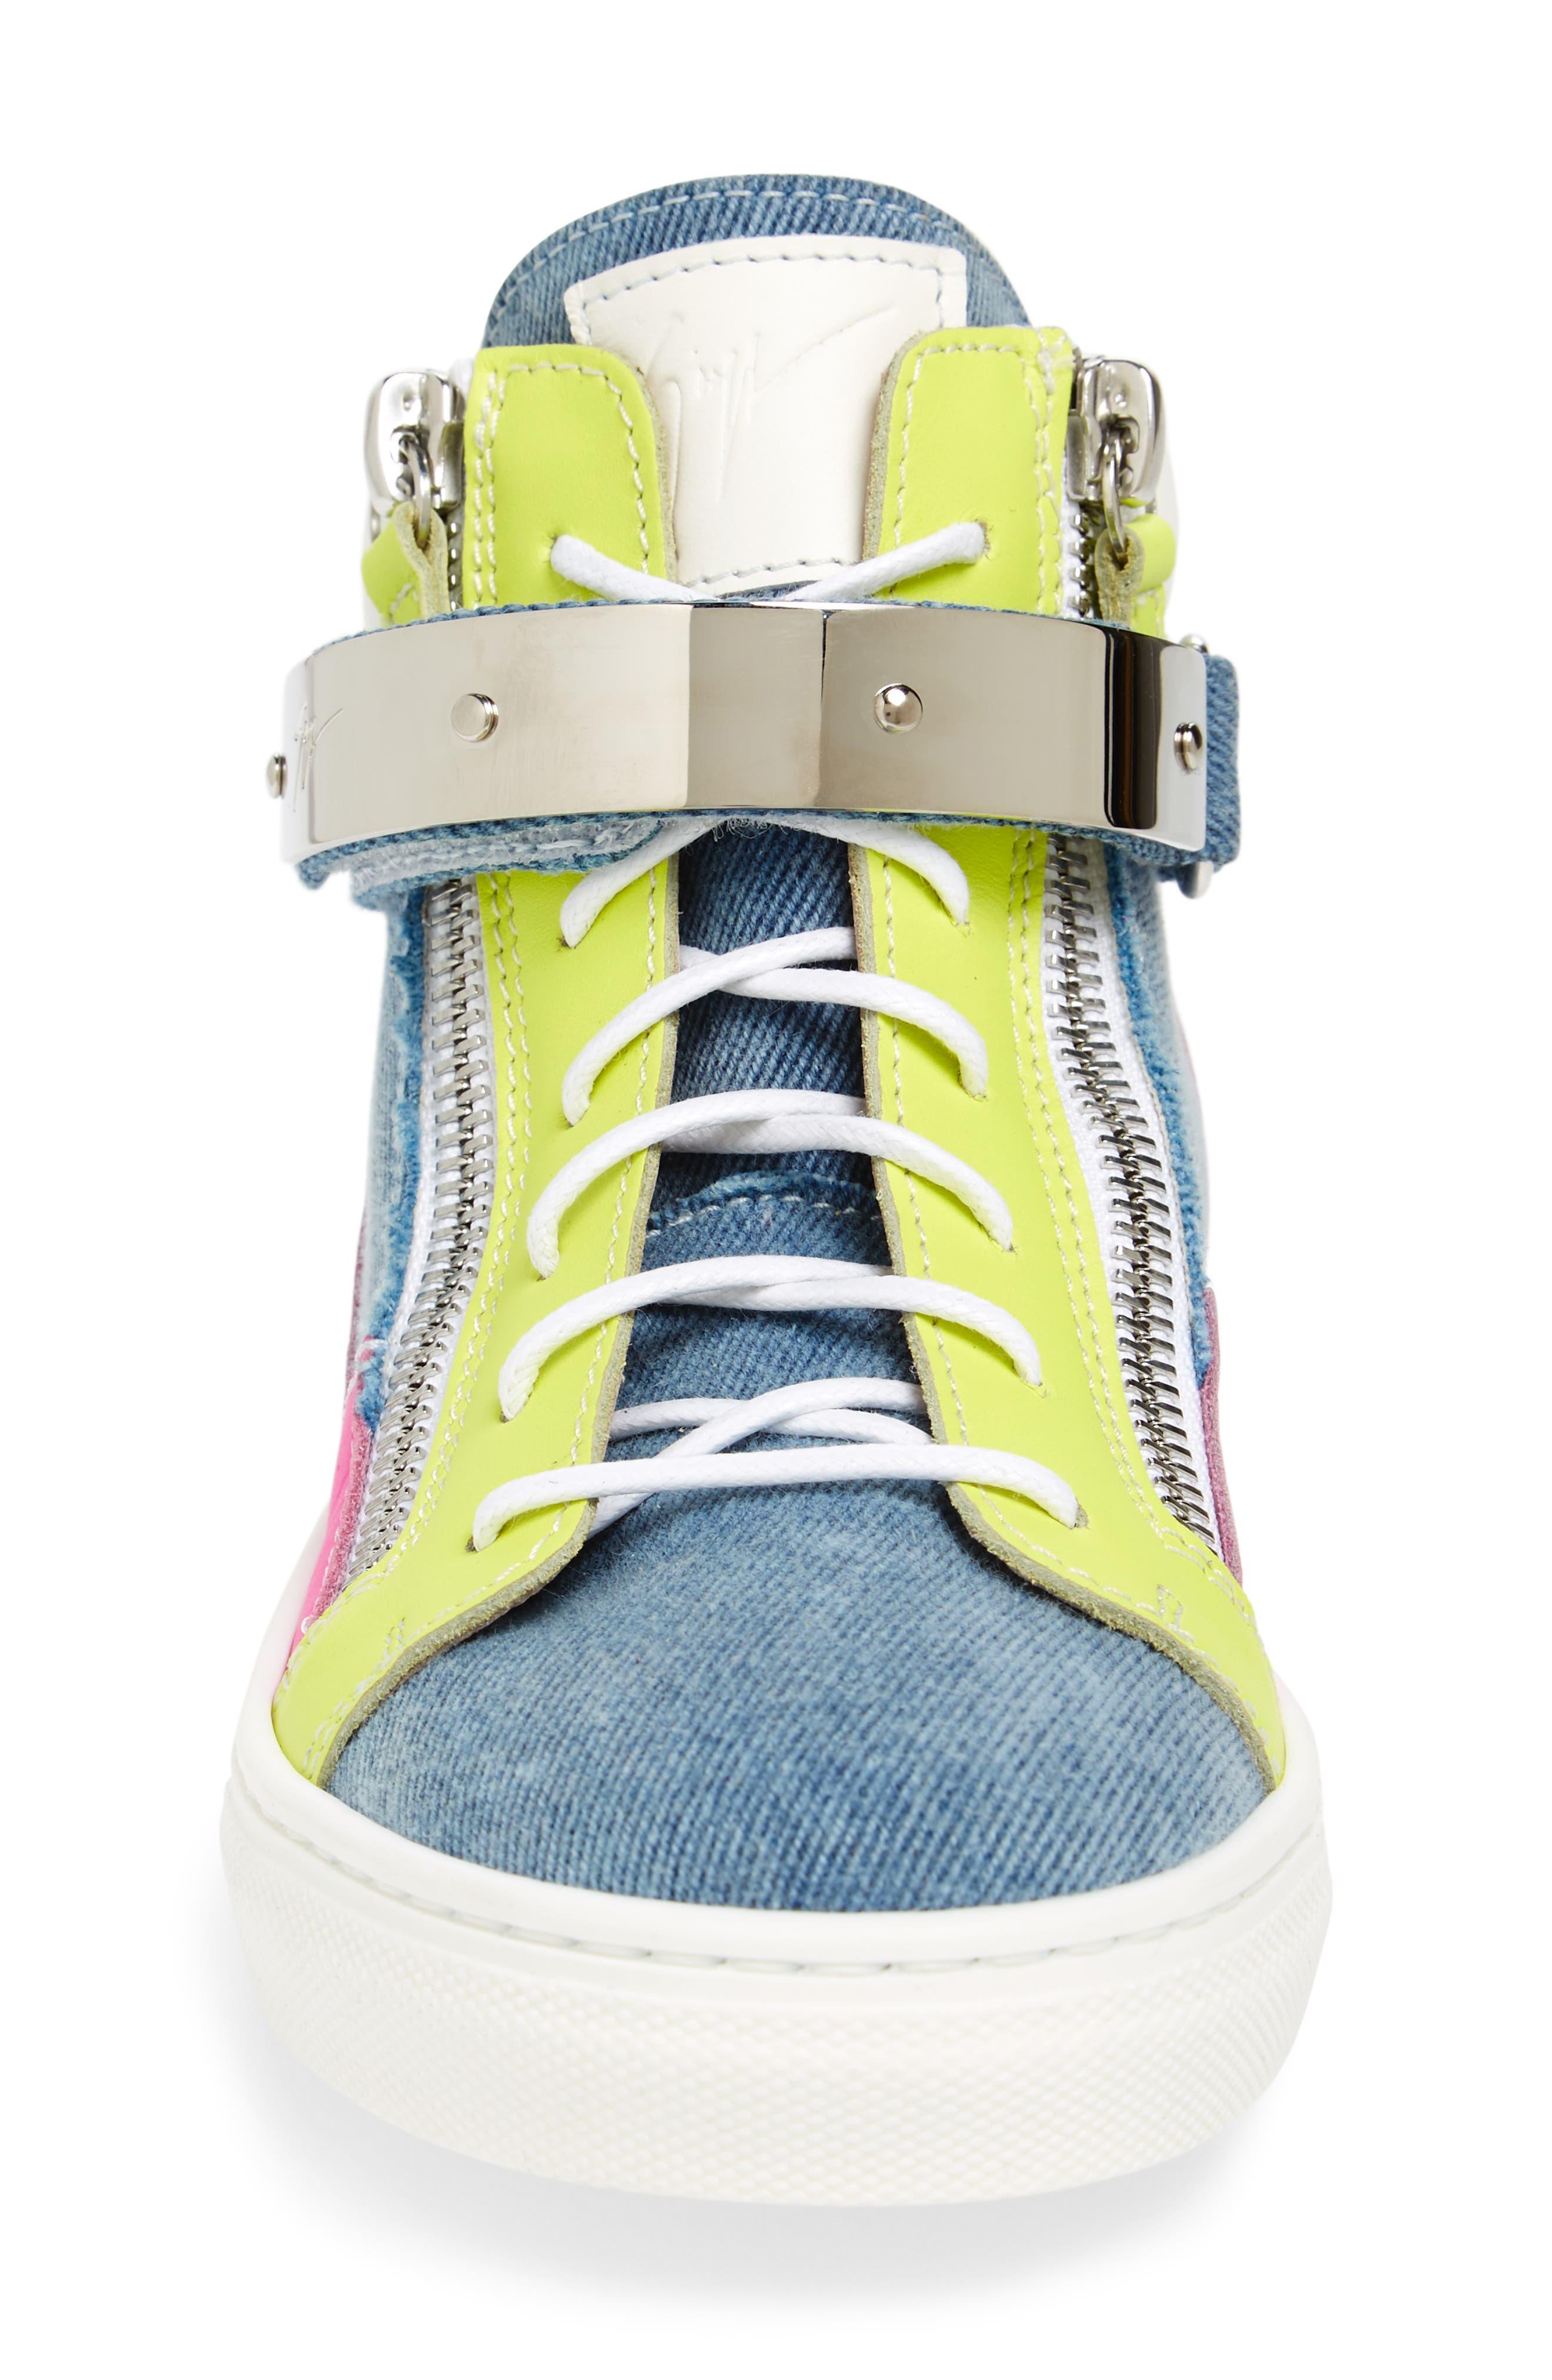 London High Top Sneaker,                             Alternate thumbnail 4, color,                             400